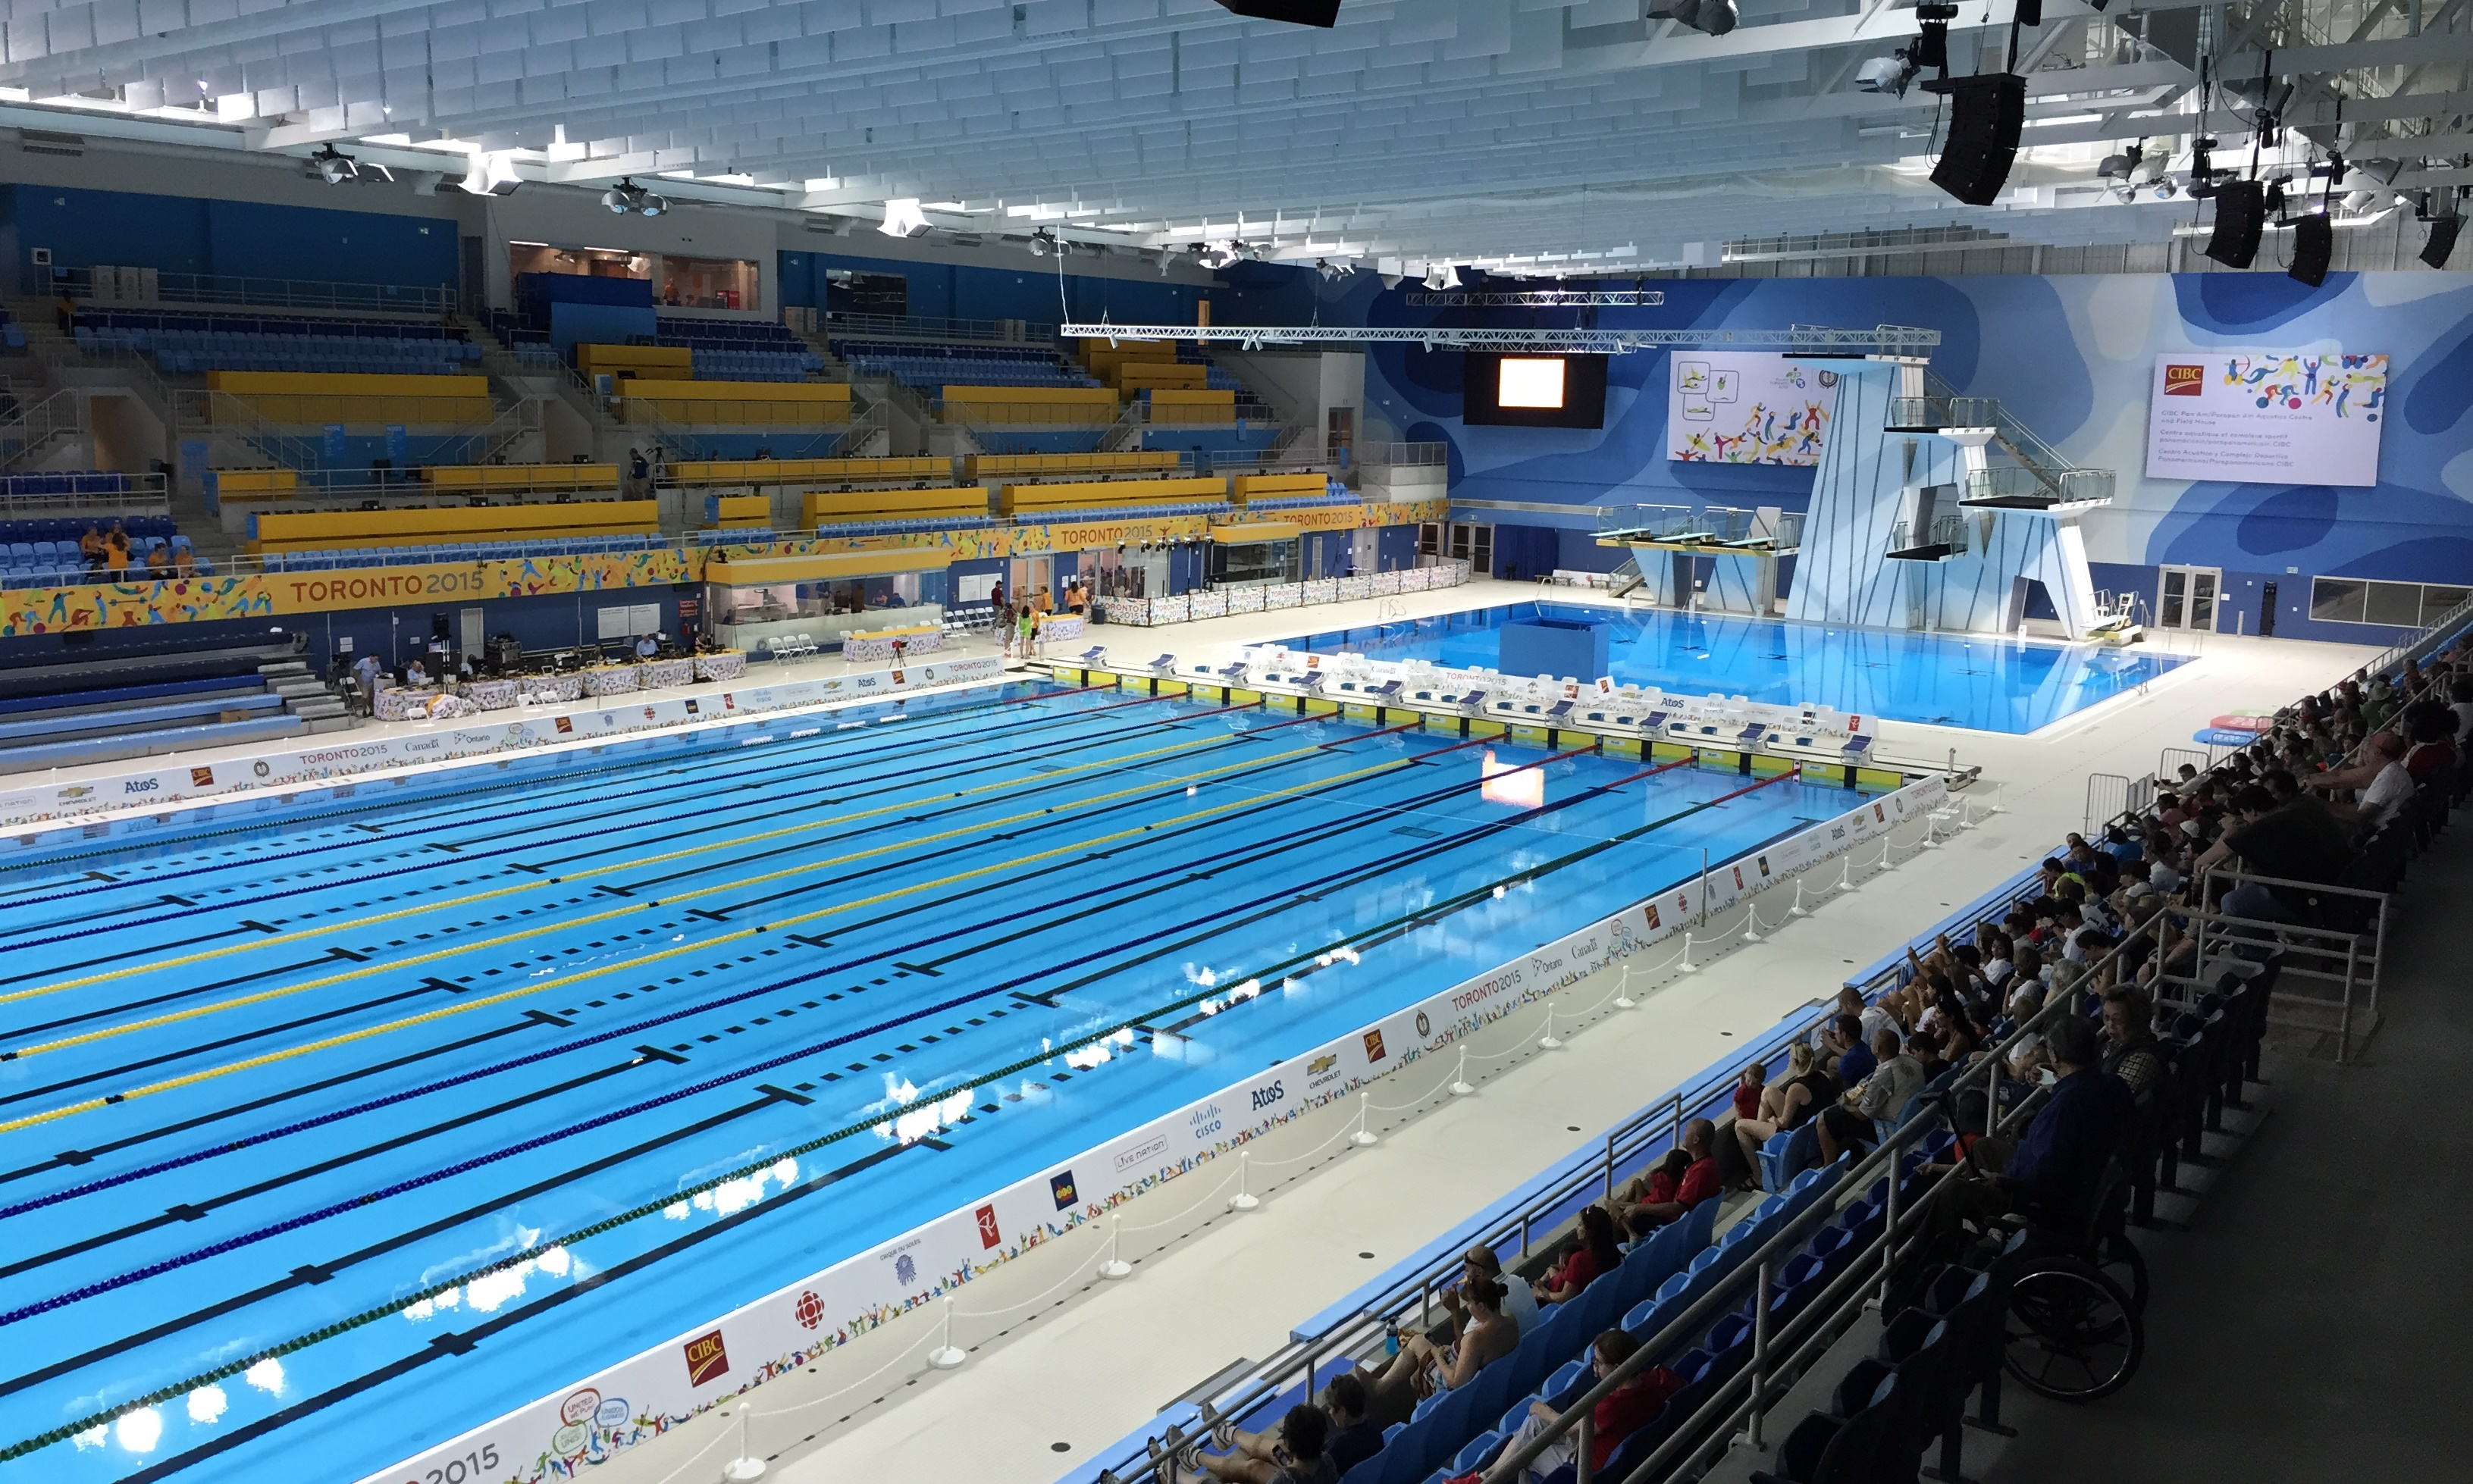 Charmant File:Toronto Pan Am Sports Centre Main Pool Pan Am Games